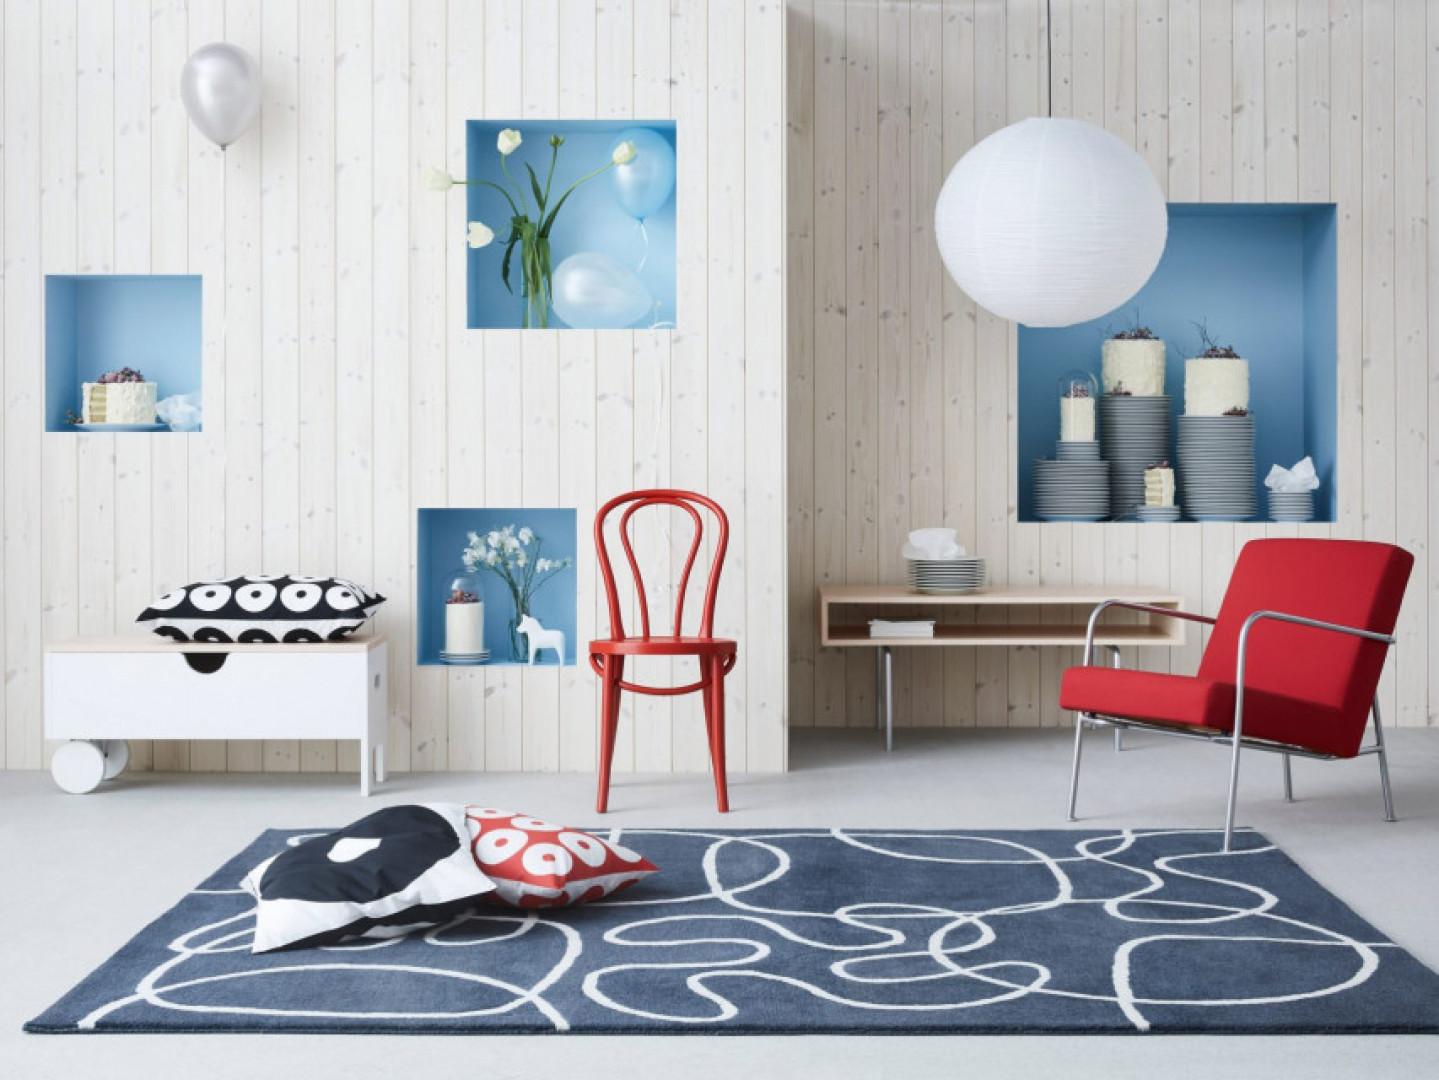 Urodzinowa kolekcja Gratulera firmy IKEA. Fot. IKEA